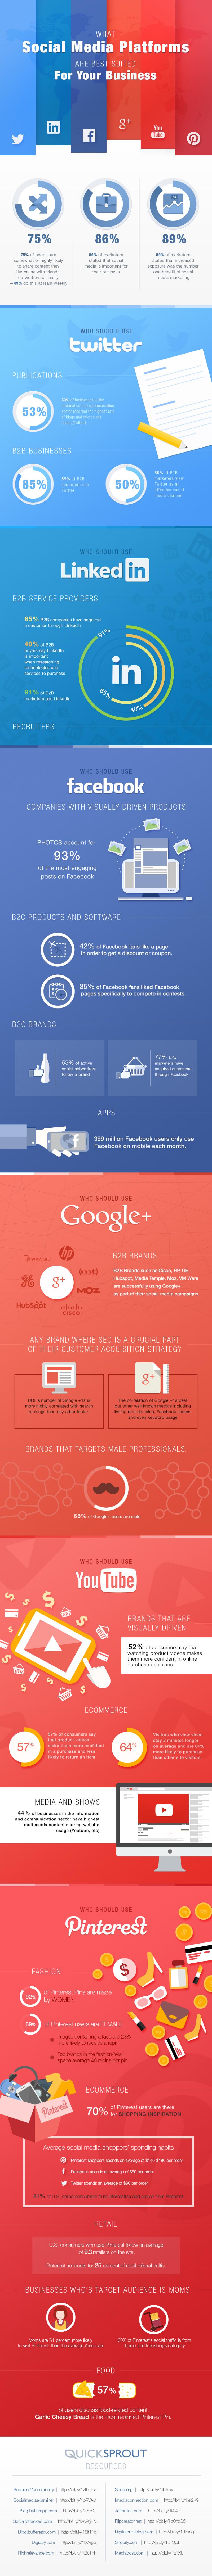 Best-Social-Media-Sites